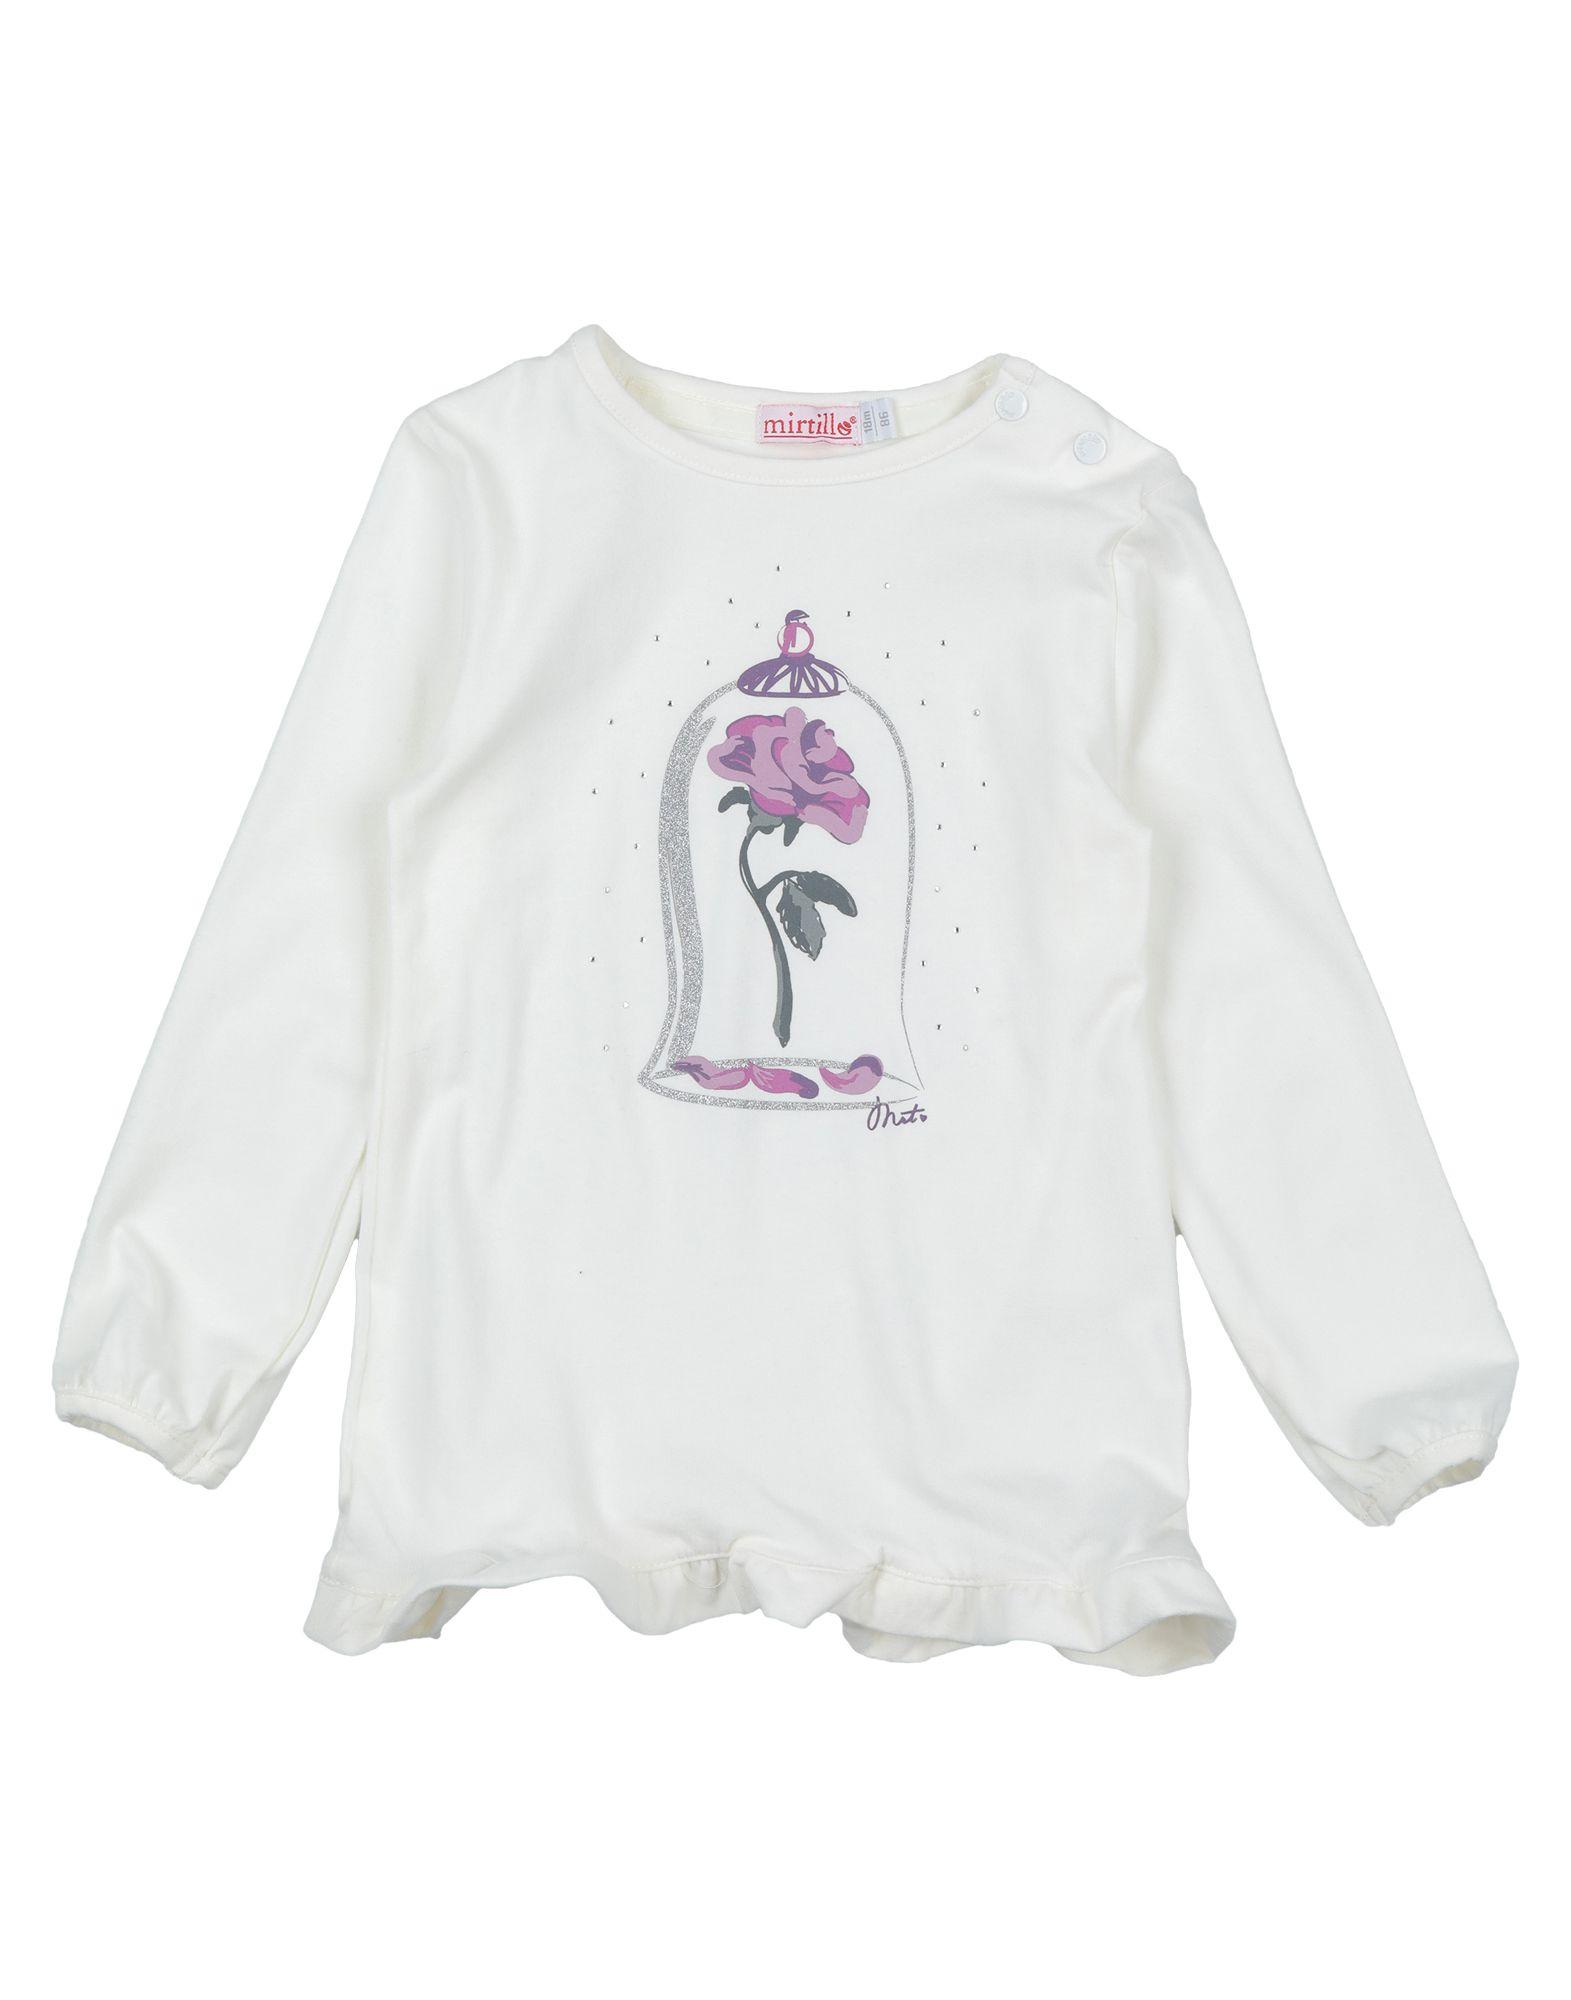 finest selection 65b32 2d369 Abbigliamento per neonato Mirtillo bambina 0-24 mesi su YOOX